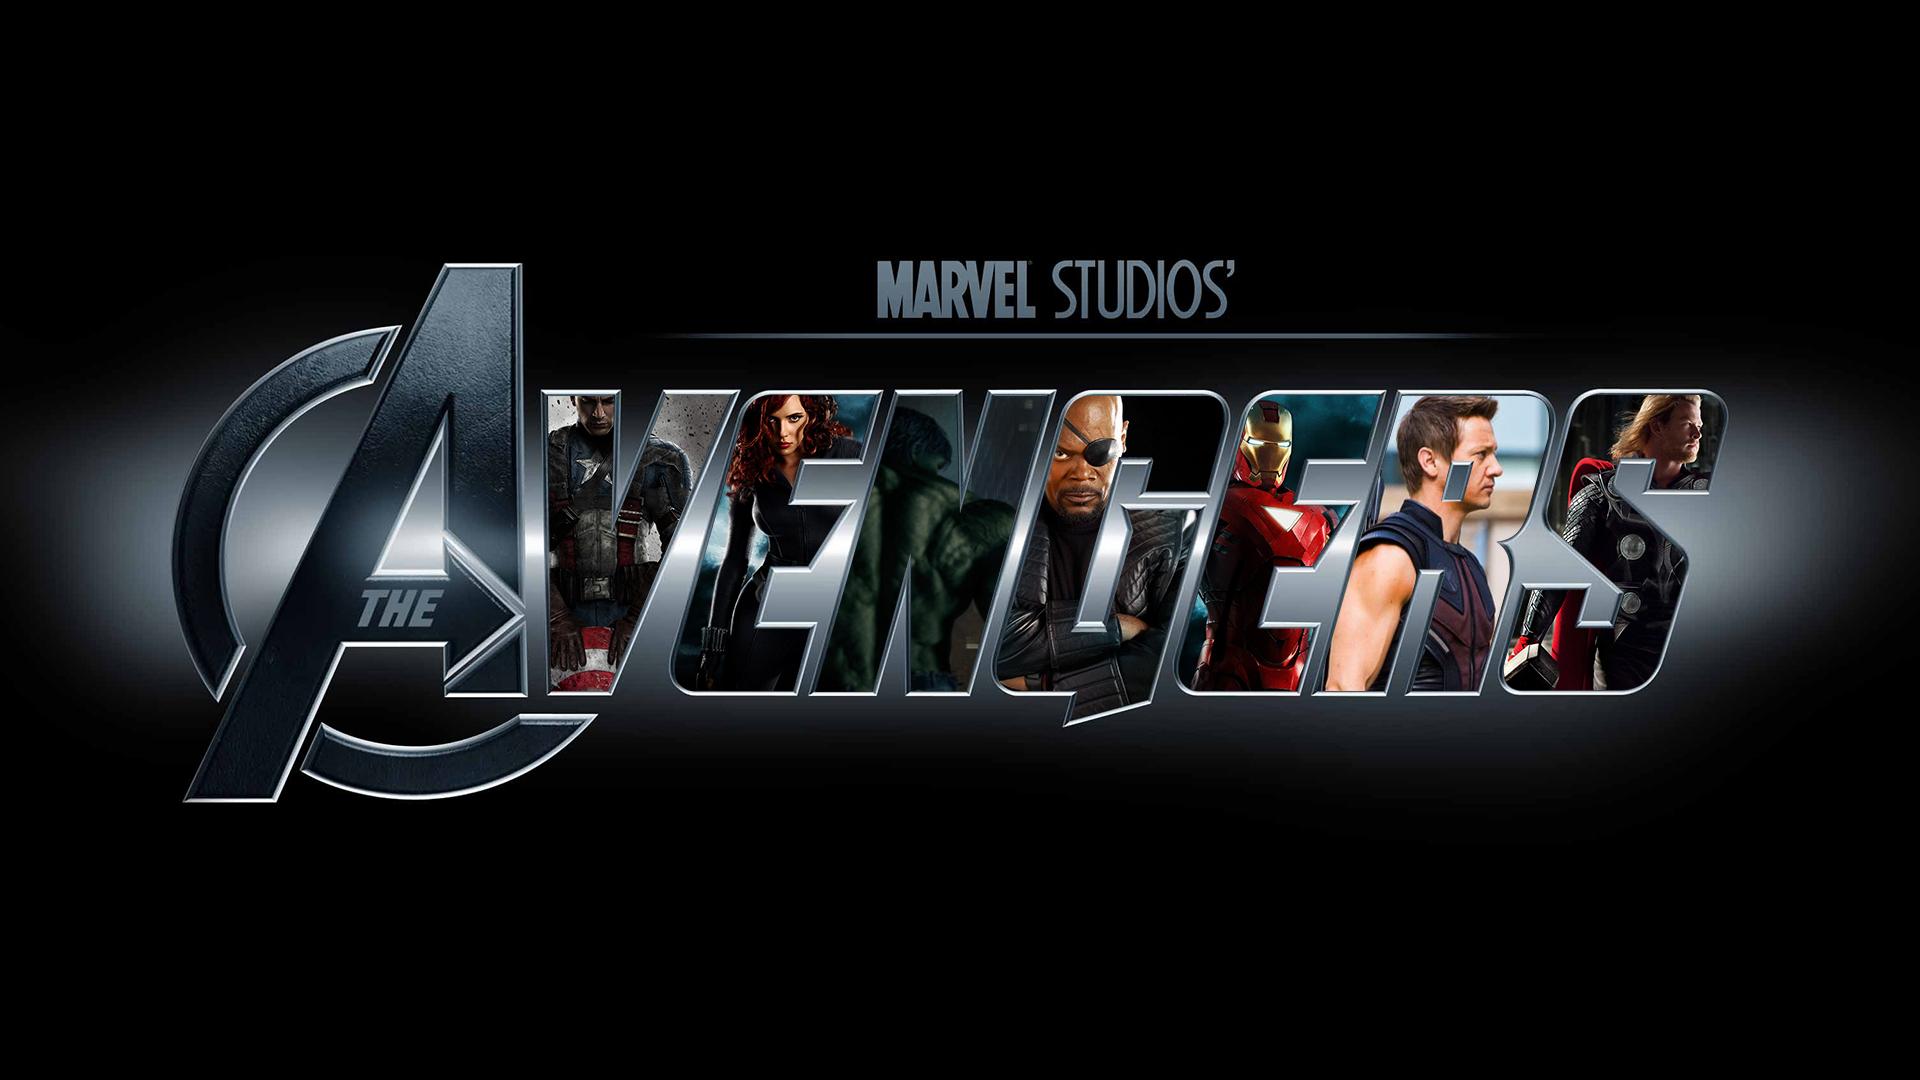 The Avengers Wallpaper 46251 1920x1080 px HDWallSourcecom